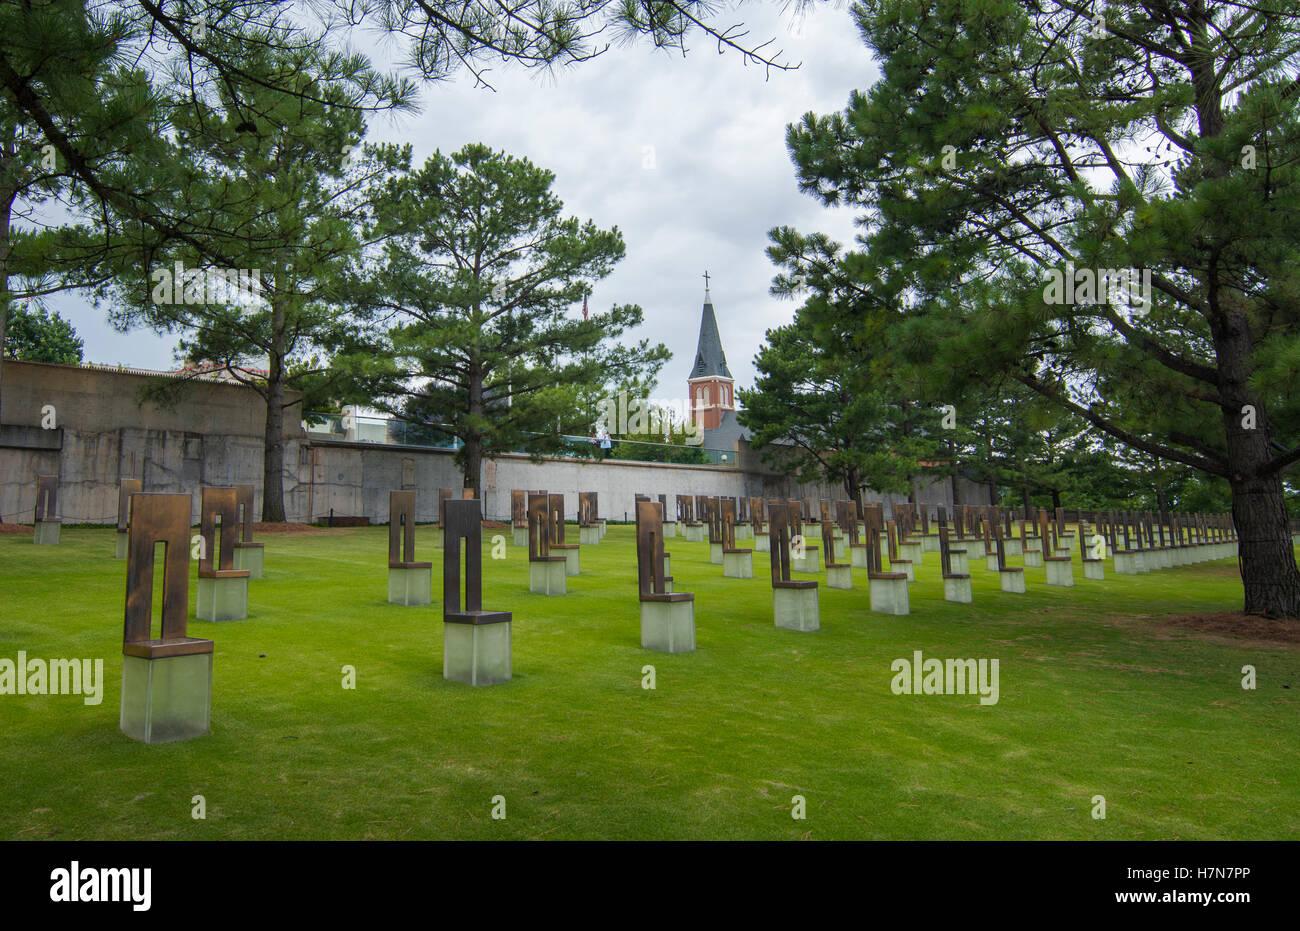 Oklahoma City Oklahoma OK, OKC, historical disaster OKC bombing remains at OKC Bombing Memorial that happened on - Stock Image